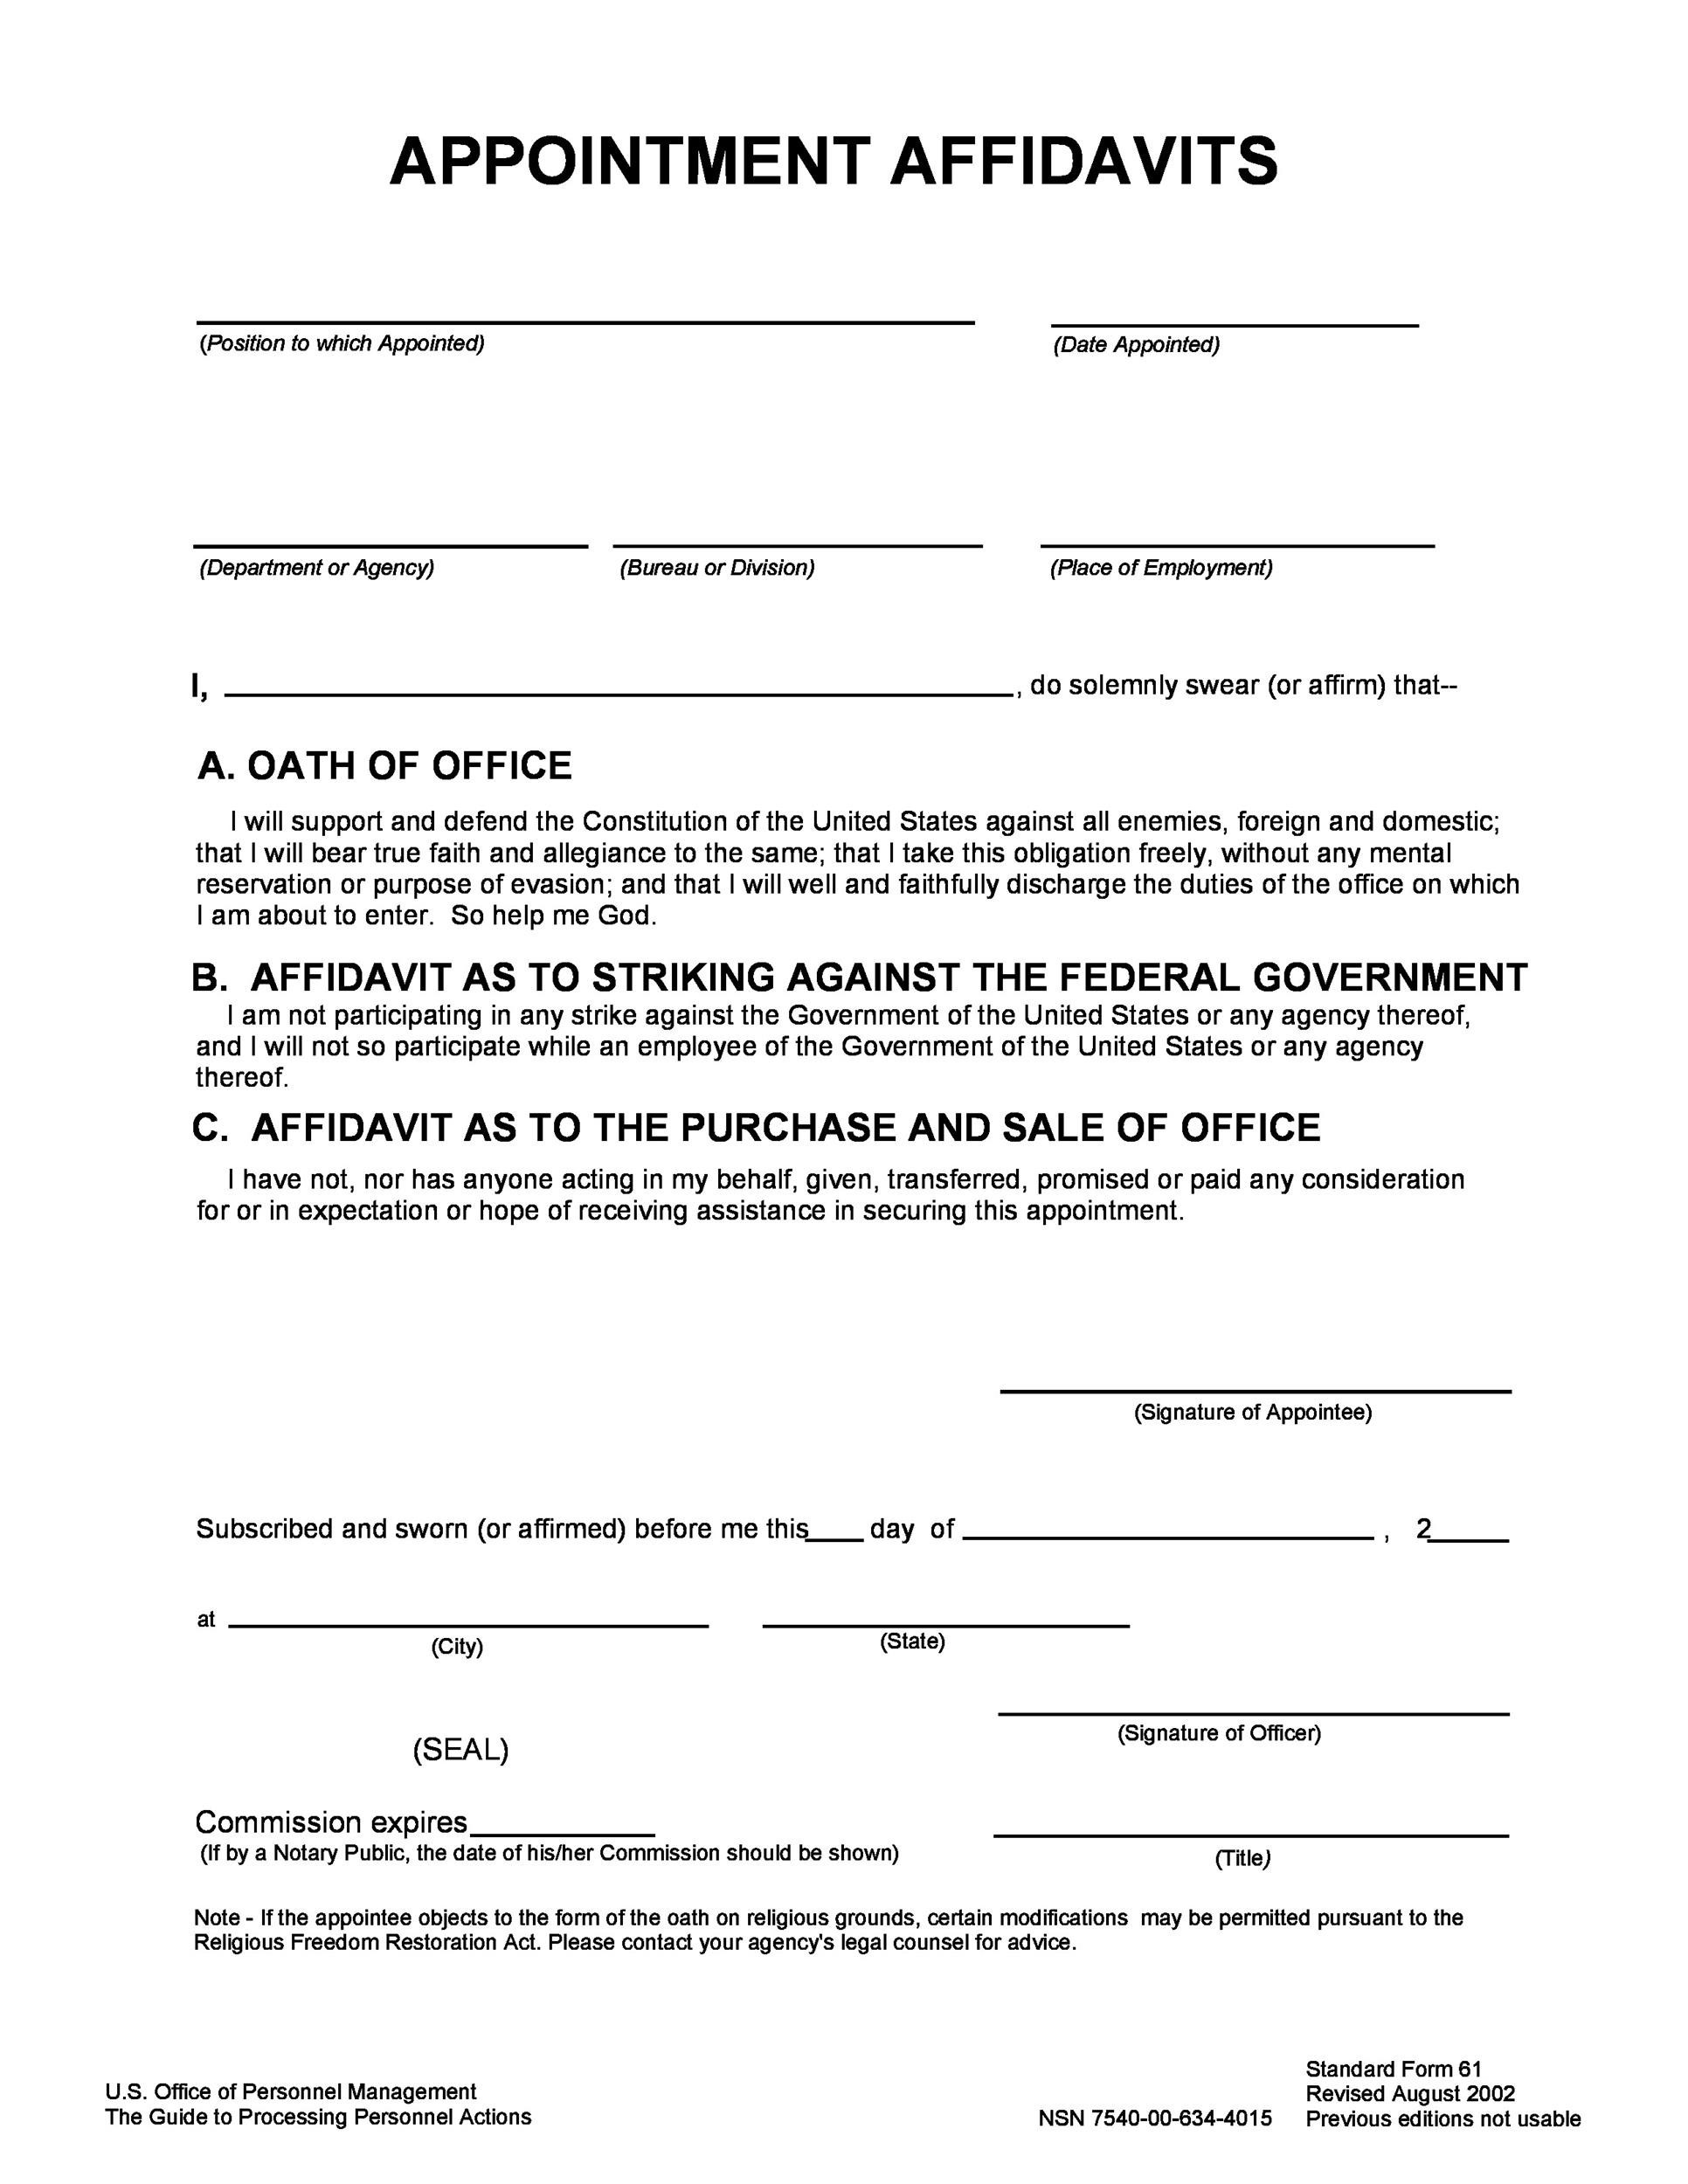 affidavit form 48